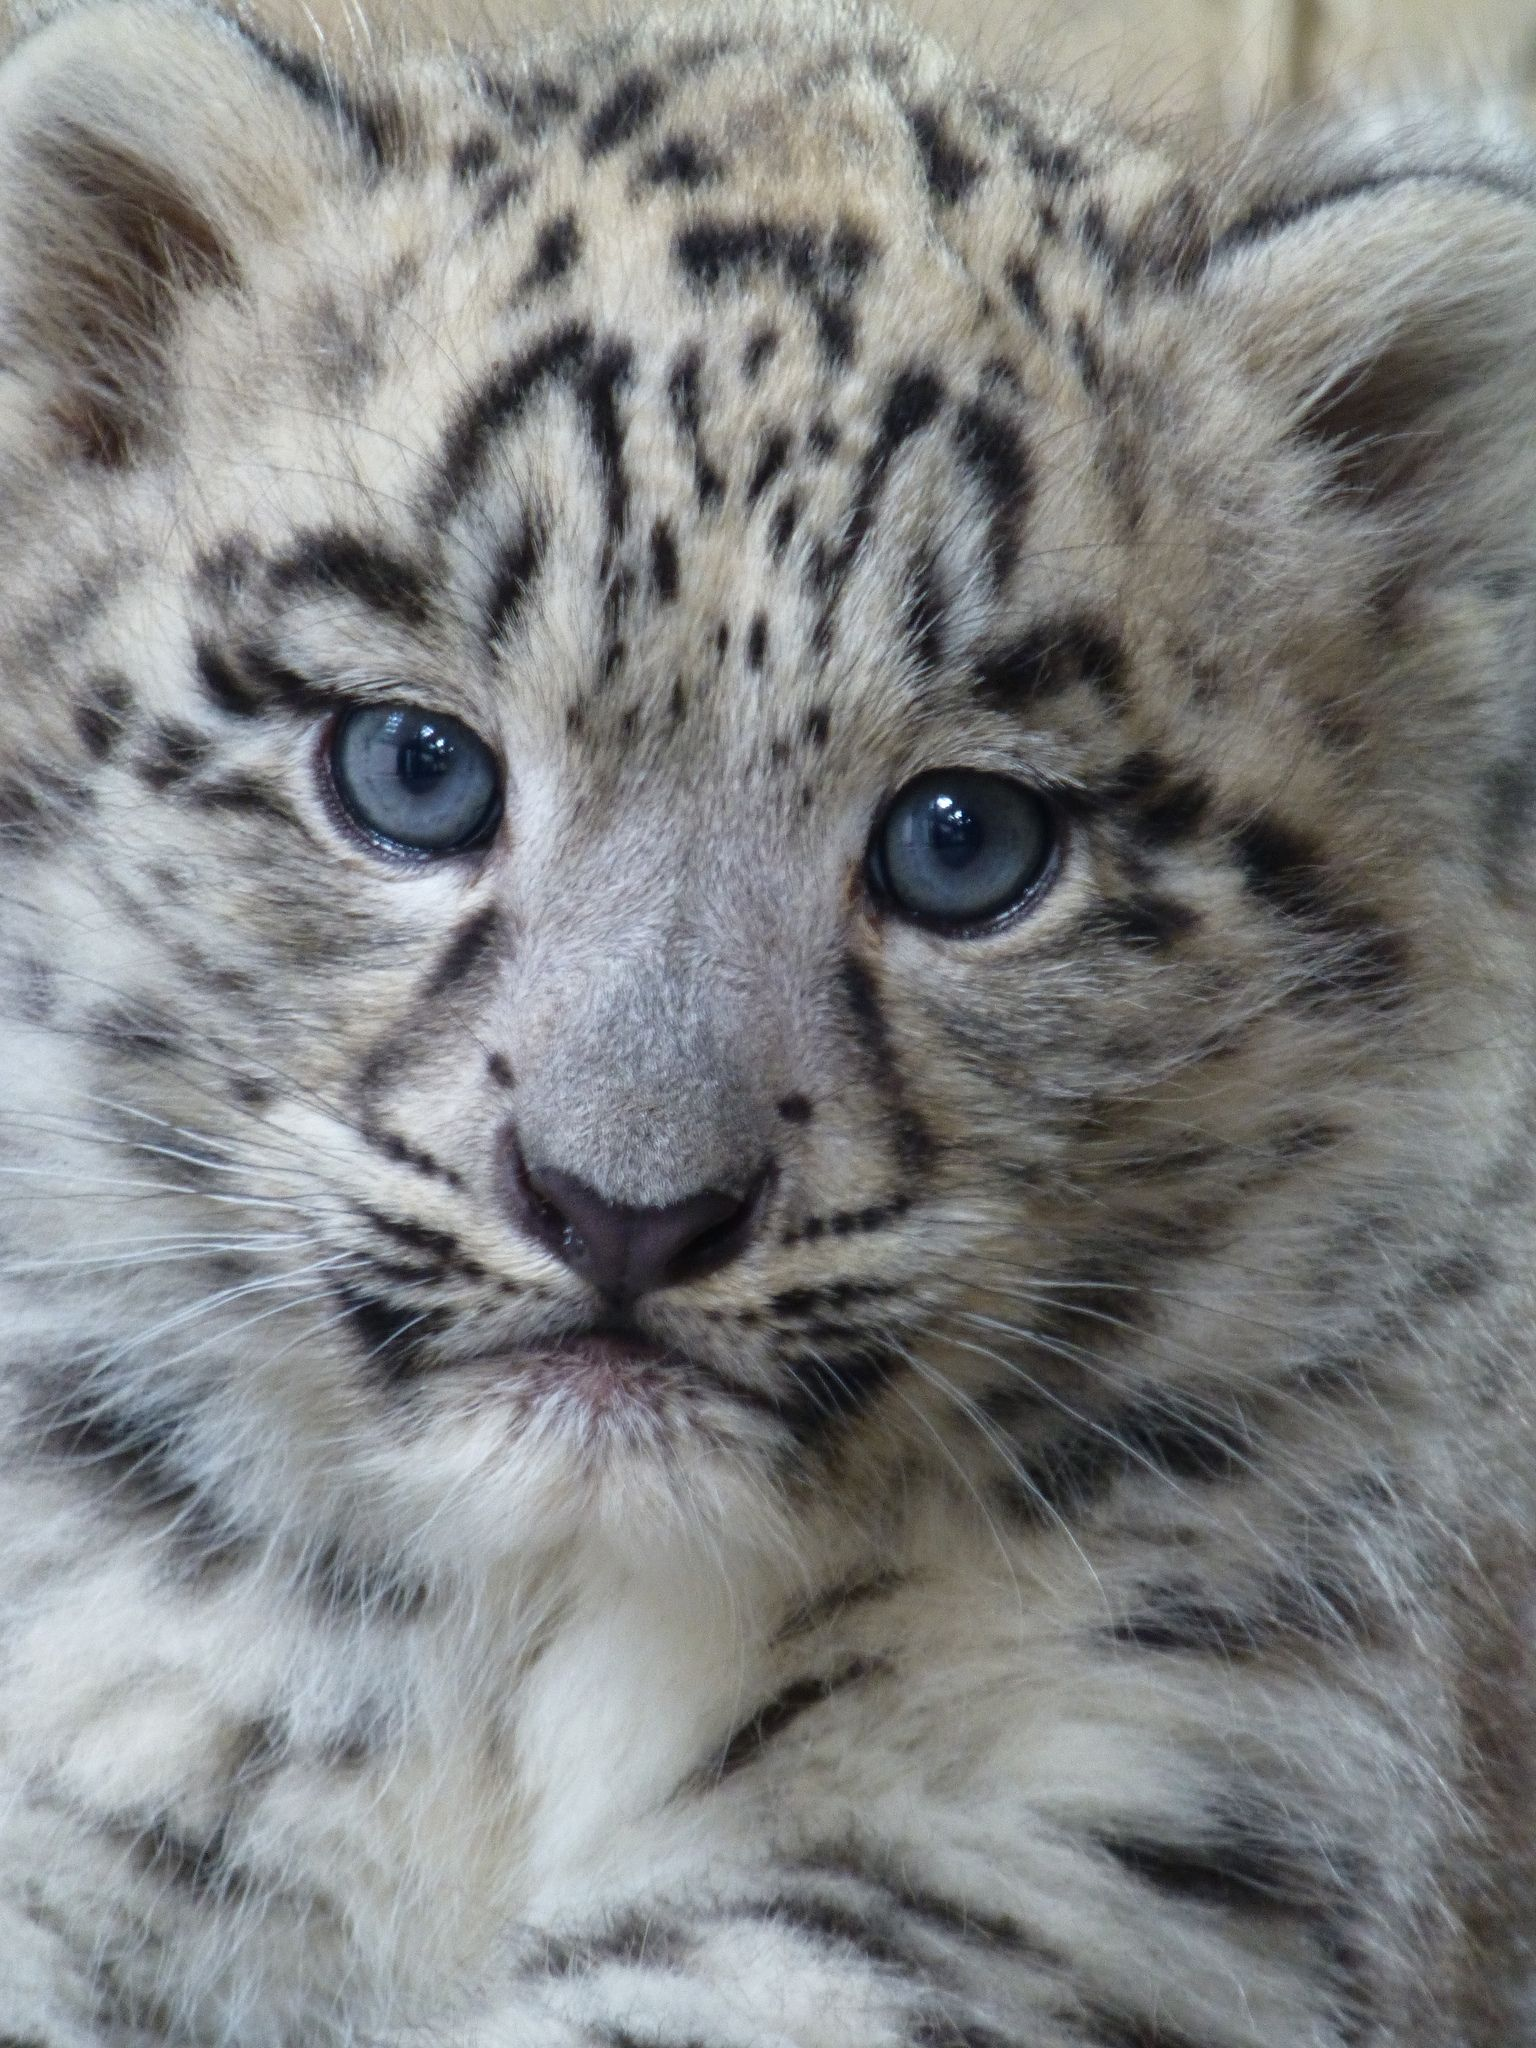 Baby Snow Leopards With Blue Eyes | www.pixshark.com ...